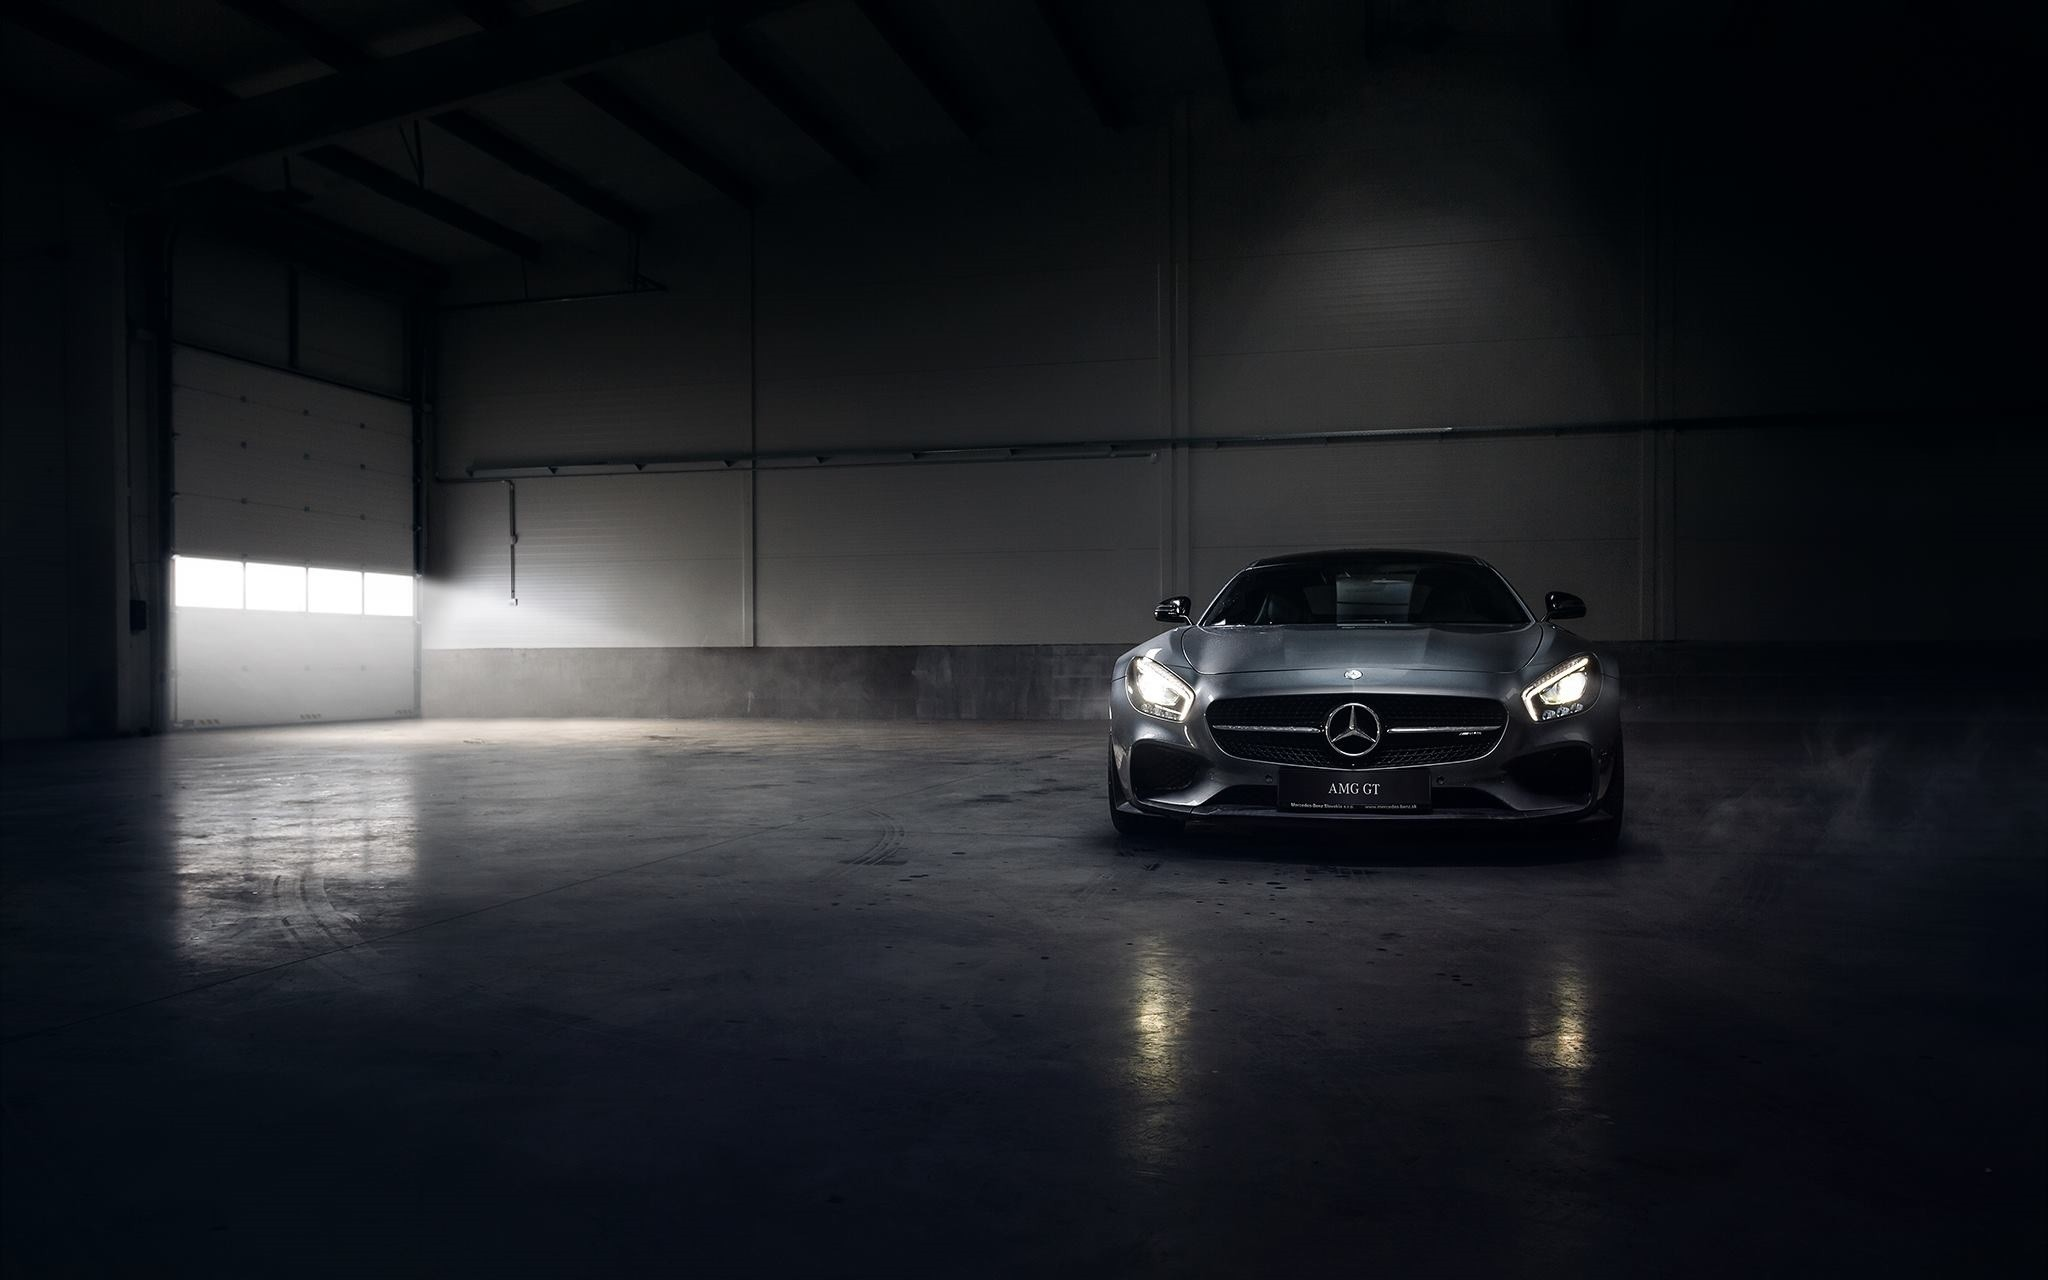 Mercedes Benz Mercedes AMG GT Car Mercedes SL 65 AMG 2048x1280